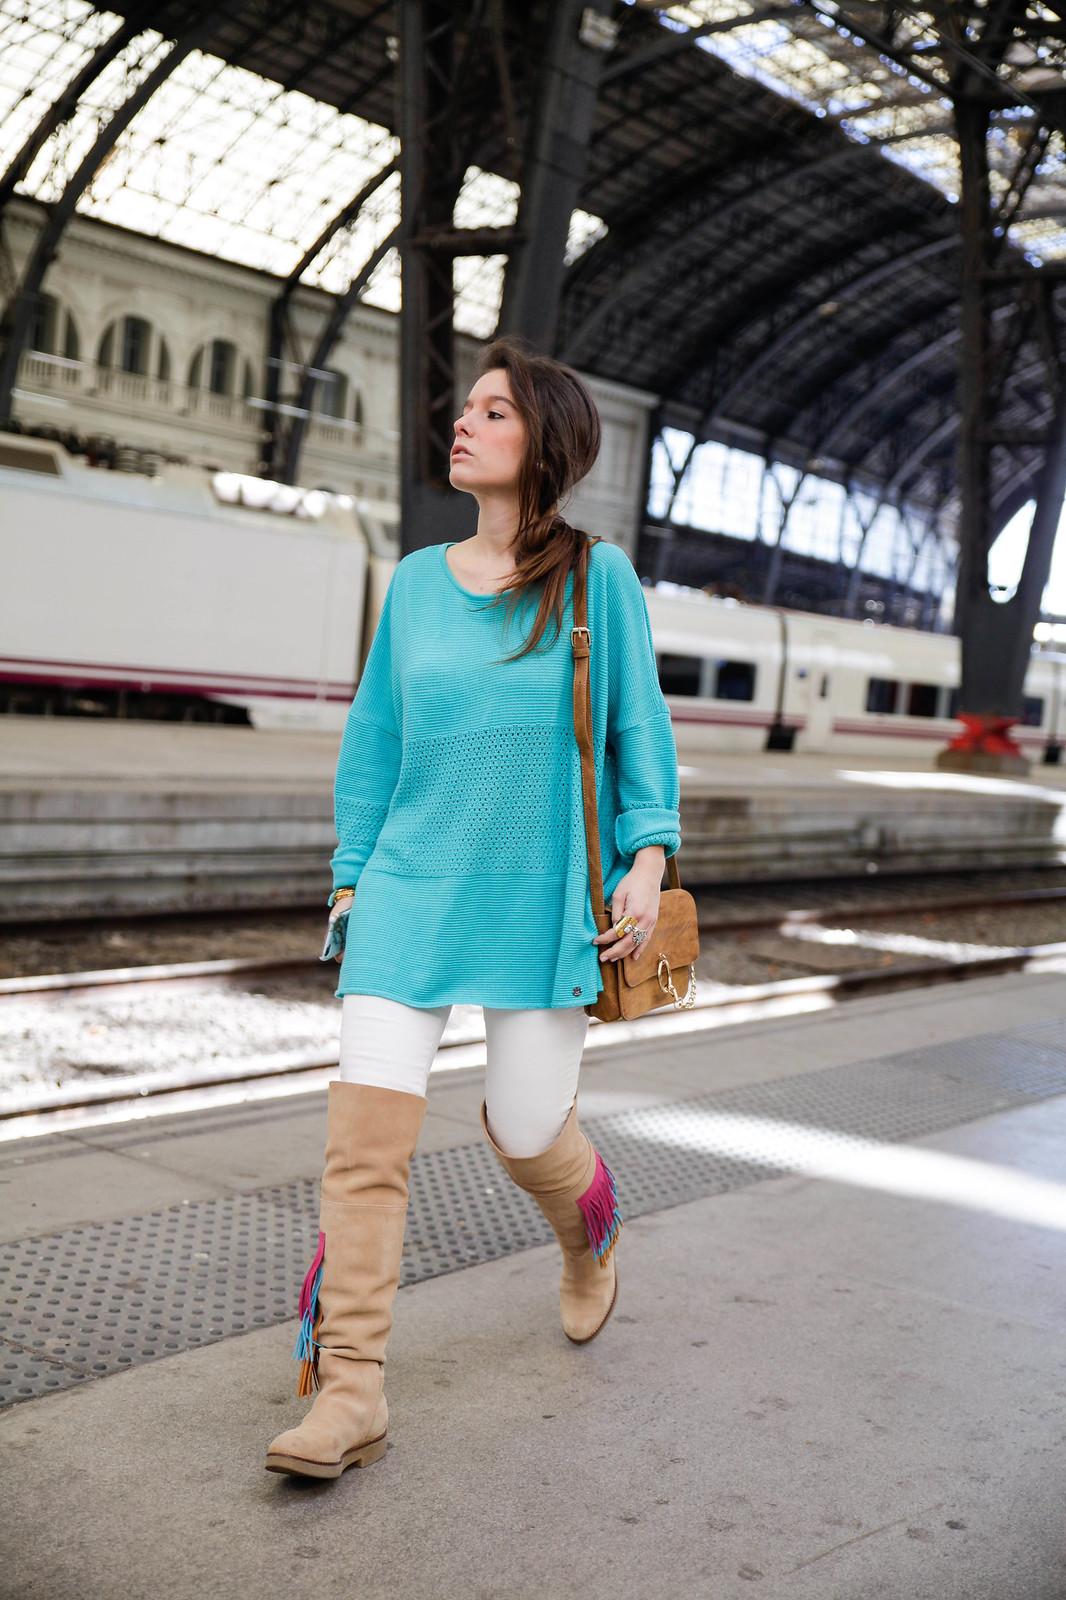 04_como_combinar_la_ropa_verde_turquesa_ideas_look_street_style_theguestgirl_ruga_boots_fringes_barcelona_influencer_top_blogger